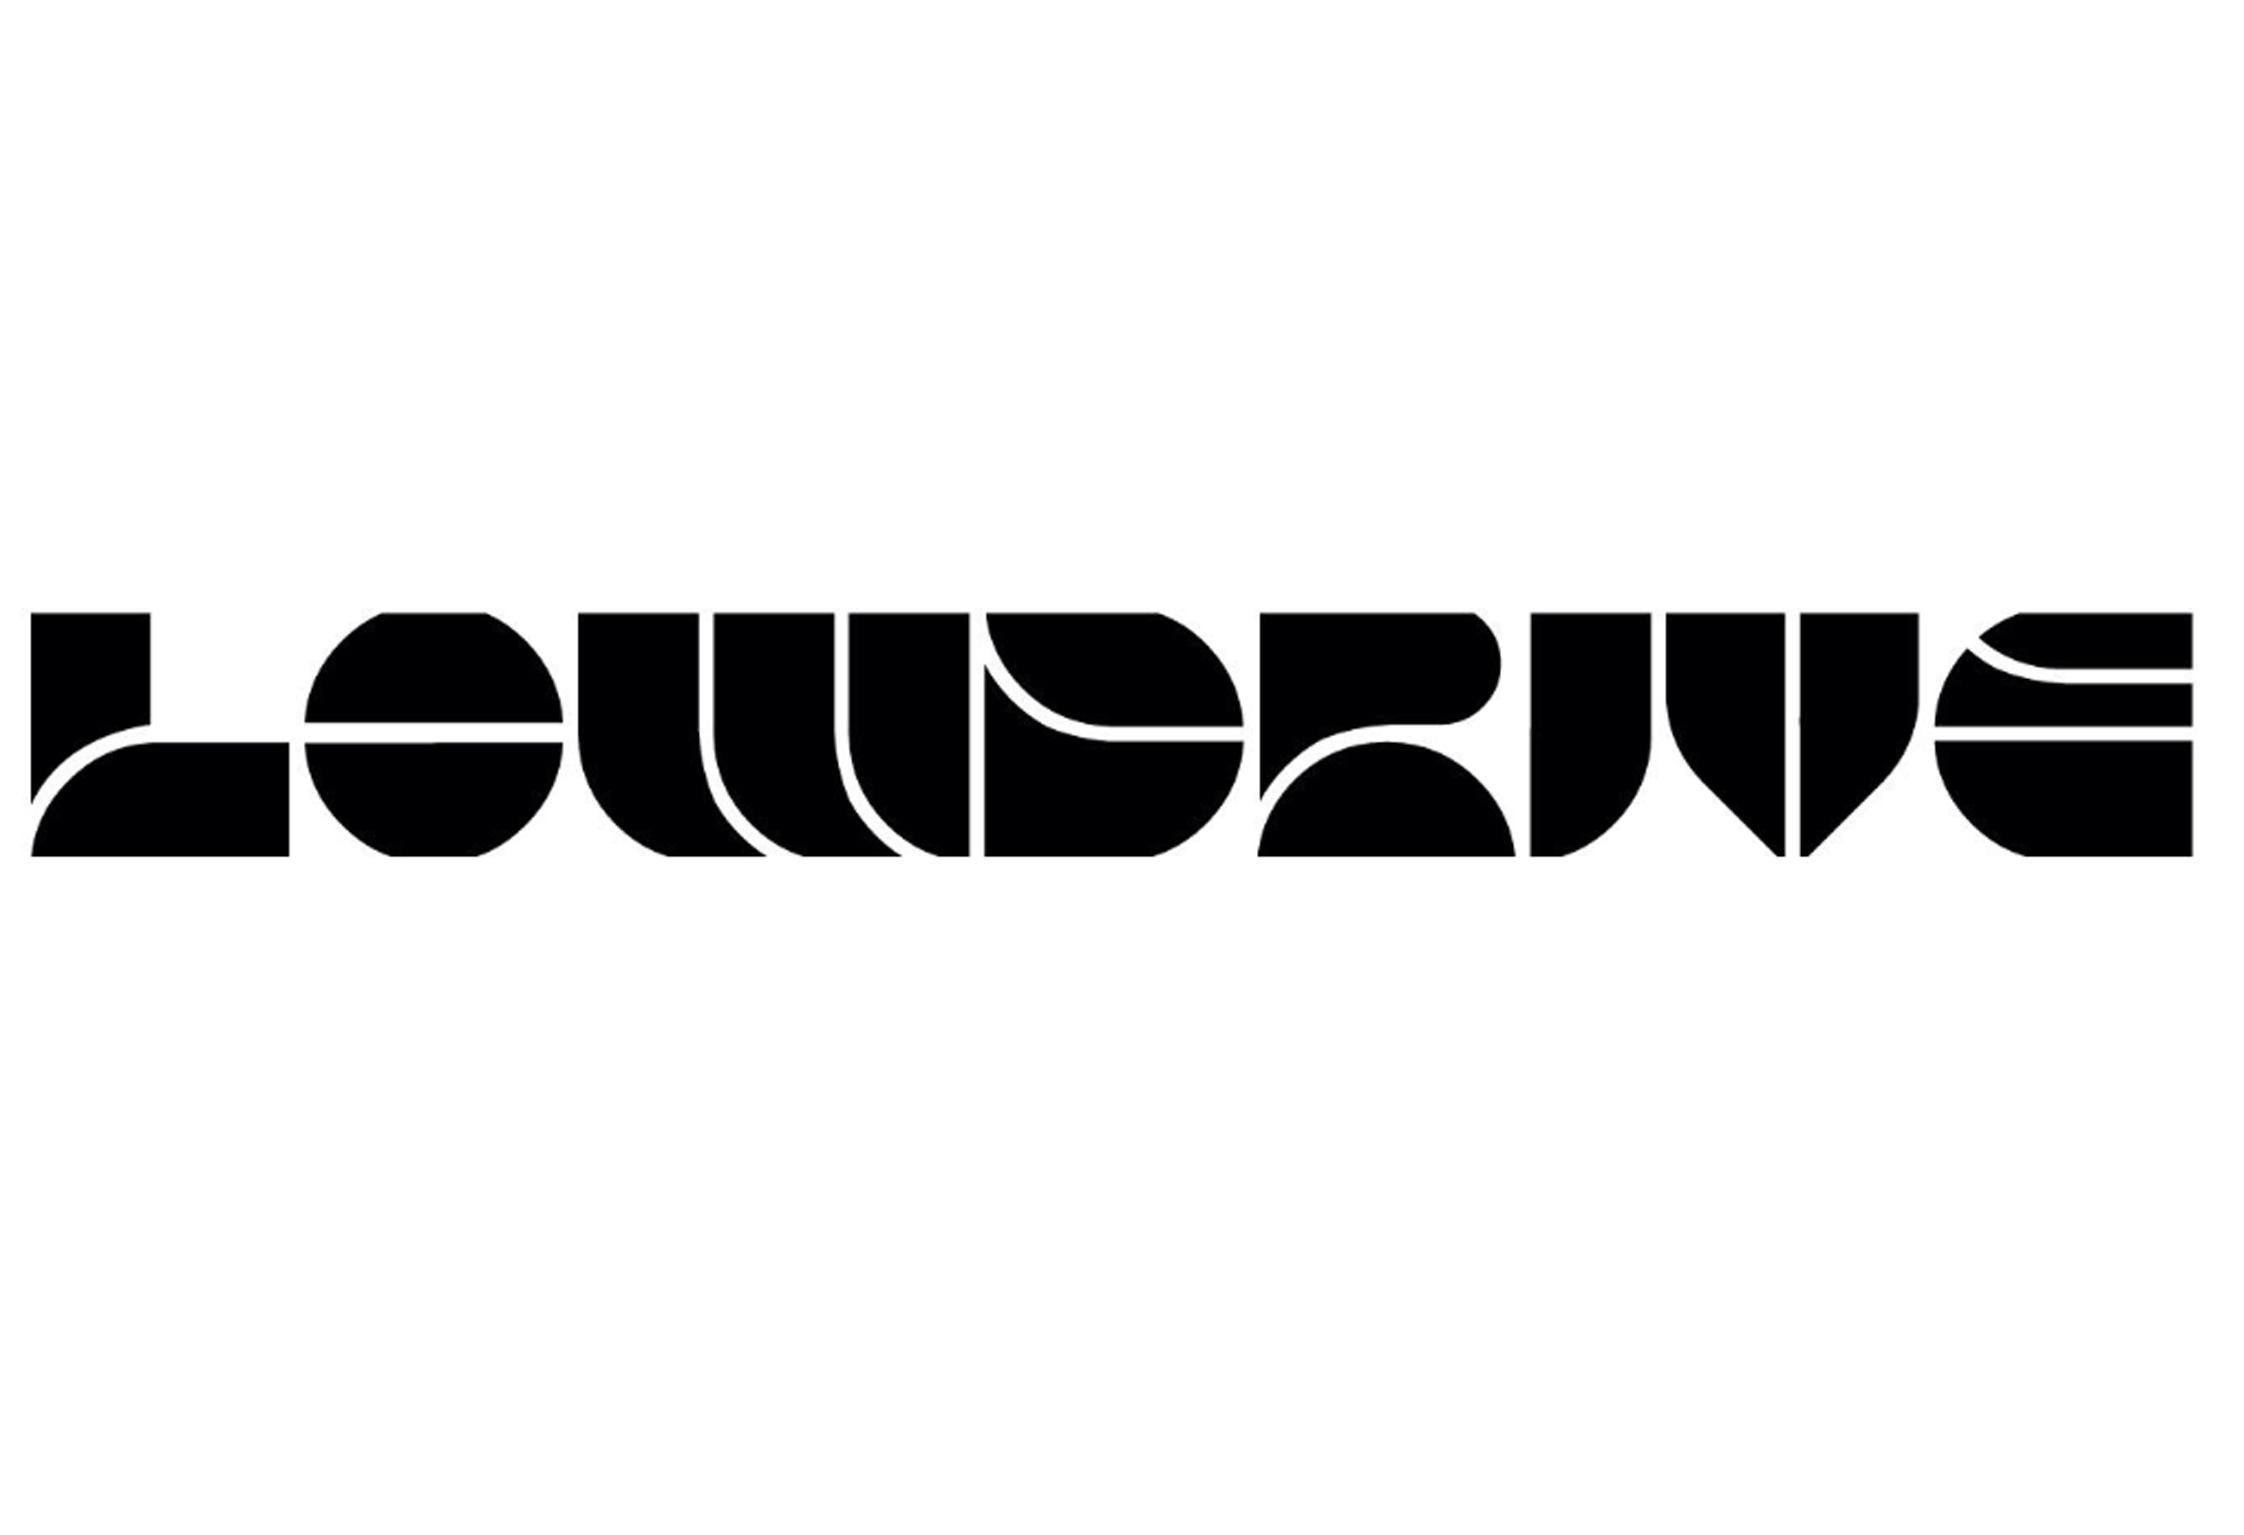 Lowdrive band logo